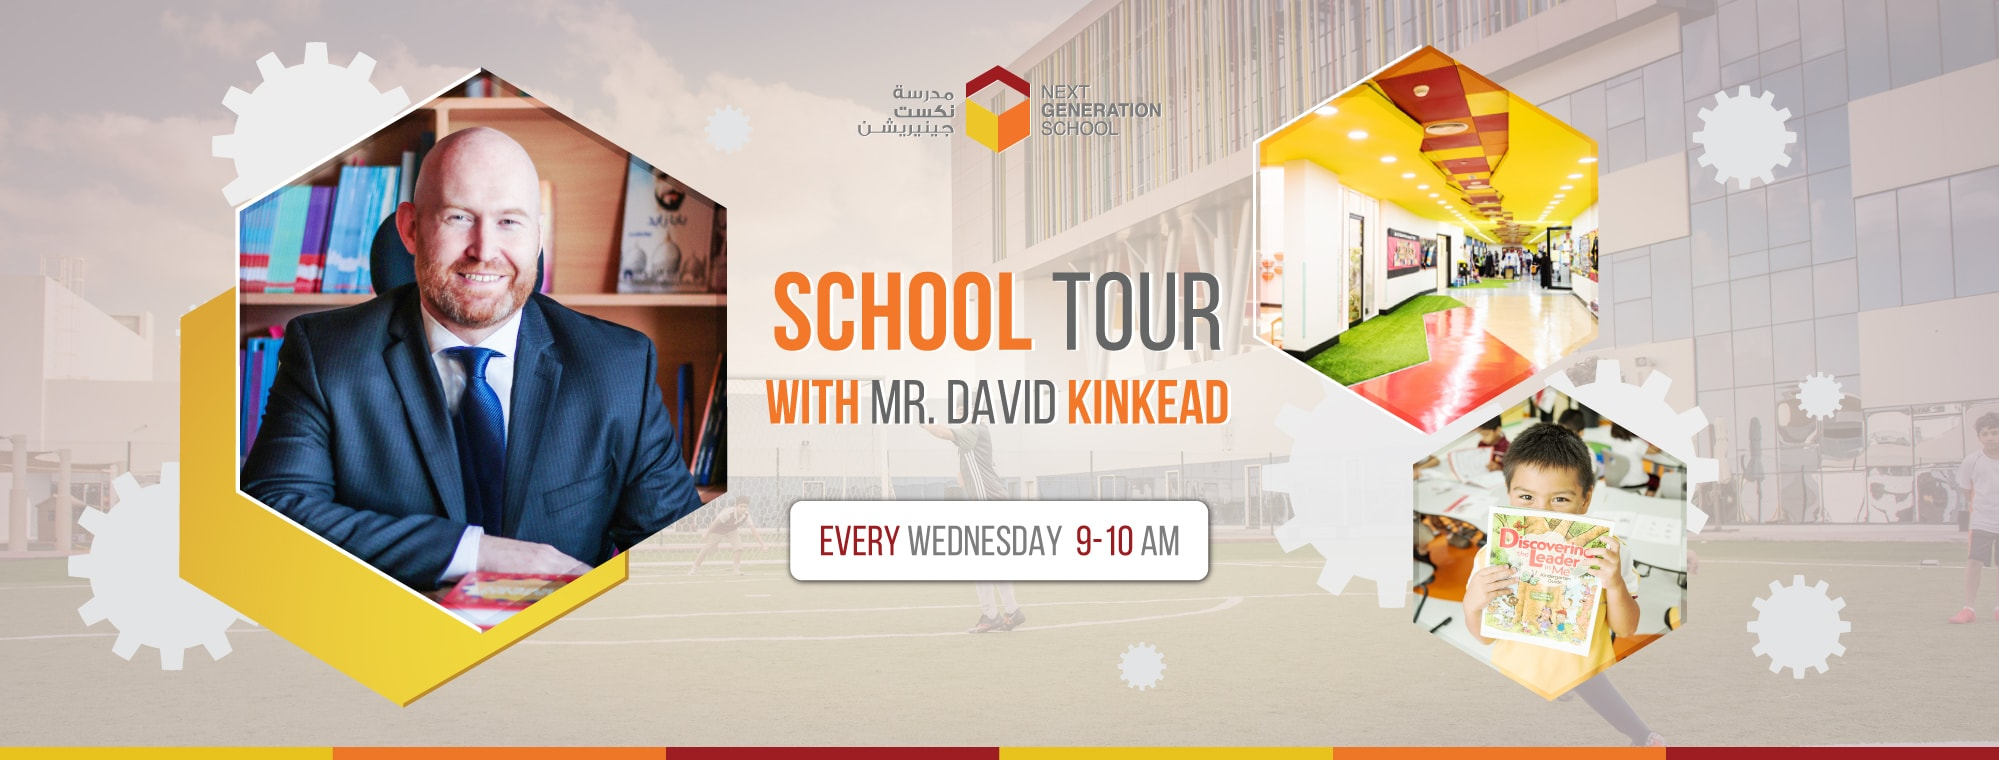 Weekly School Tours with Mr. David Kinkead